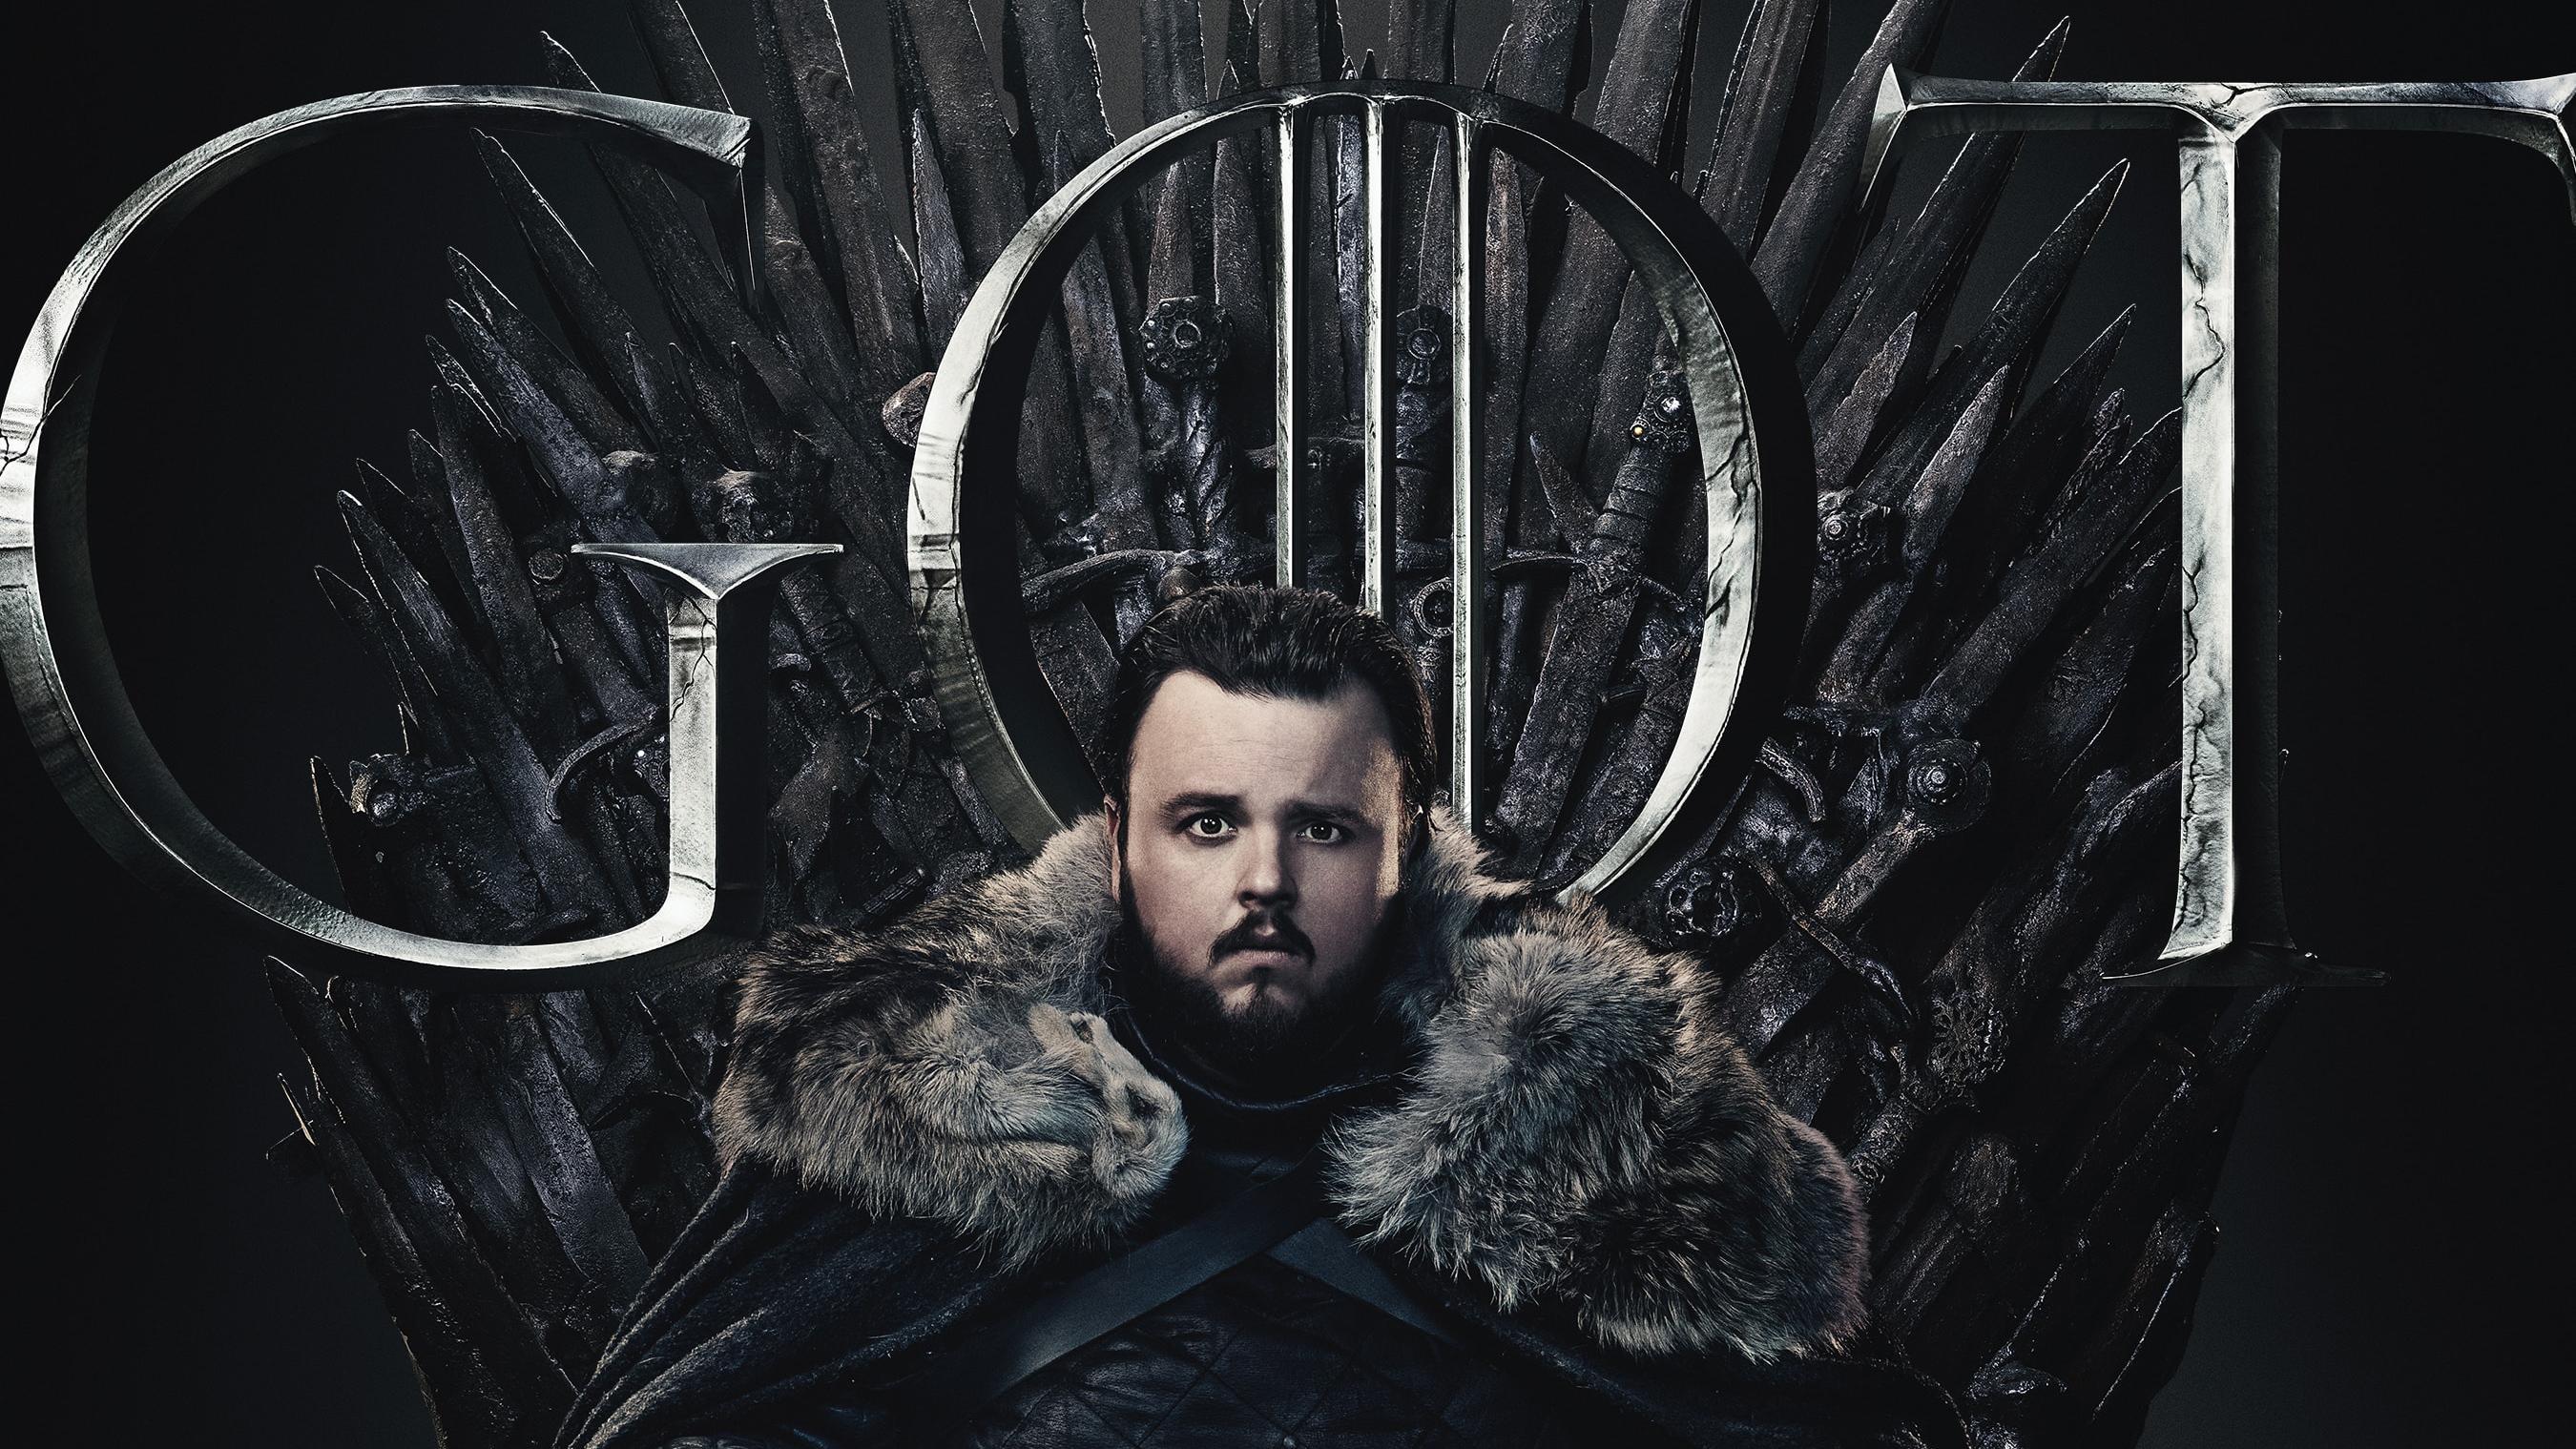 2932x2932 Pubg Android Game 4k Ipad Pro Retina Display Hd: 2932x2932 Samwell Tarly Game Of Thrones Season 8 Poster